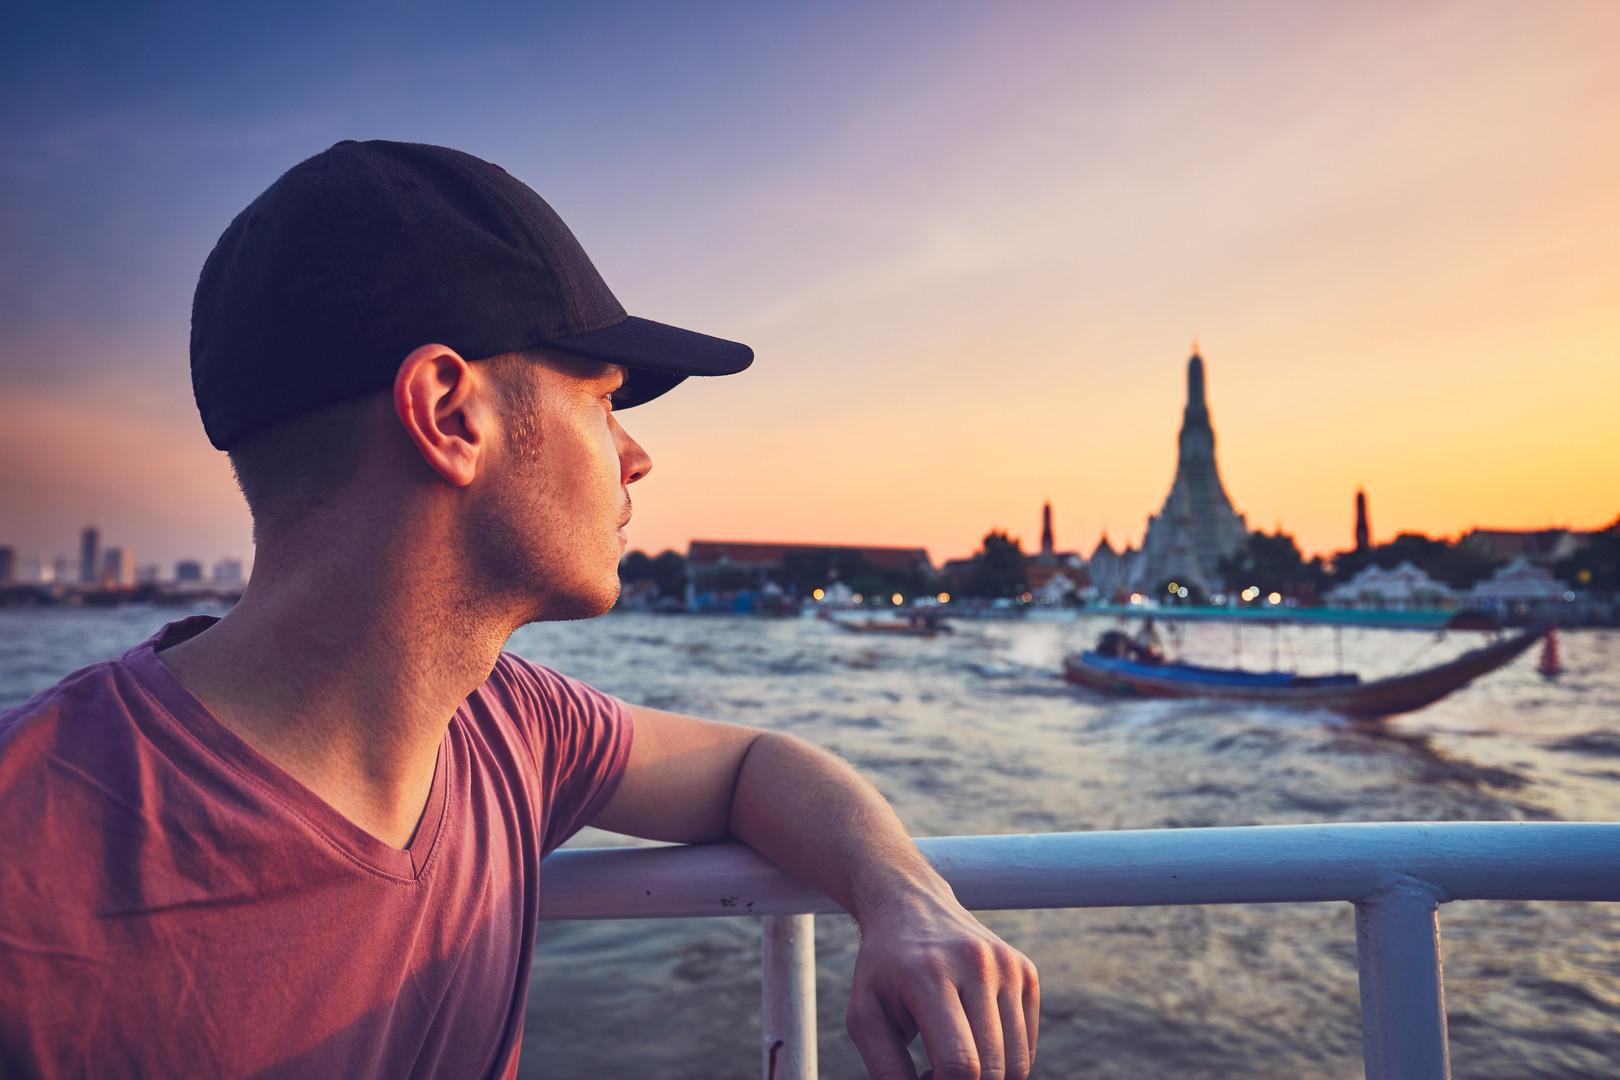 bangkok-at-the-sunset-PT6VHL6.jpg